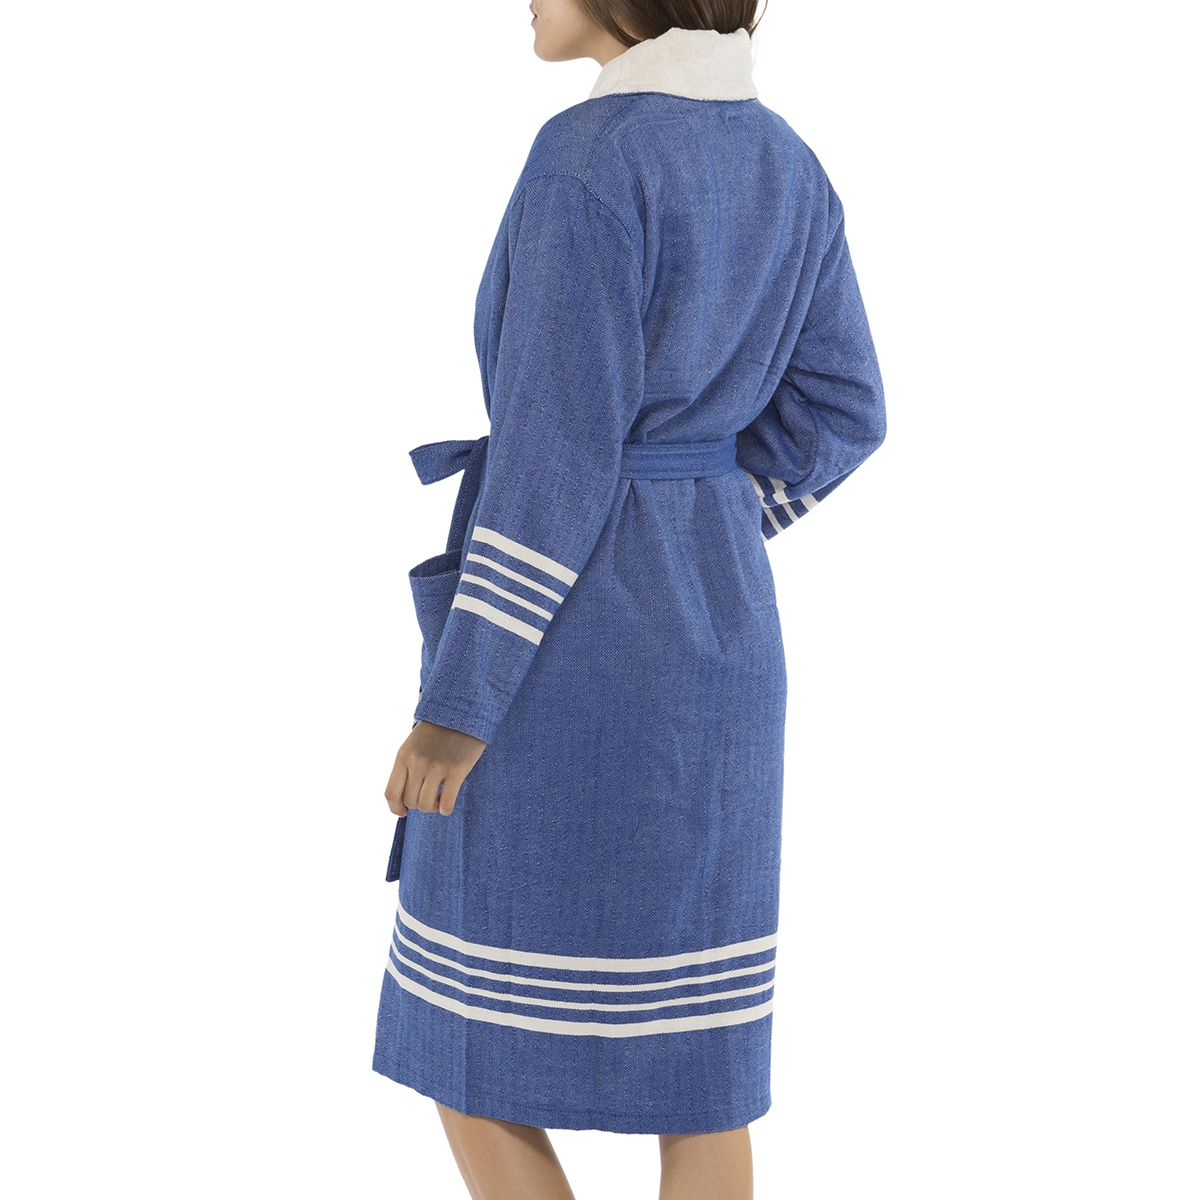 Bathrobe Sultan with towel - Royal Blue